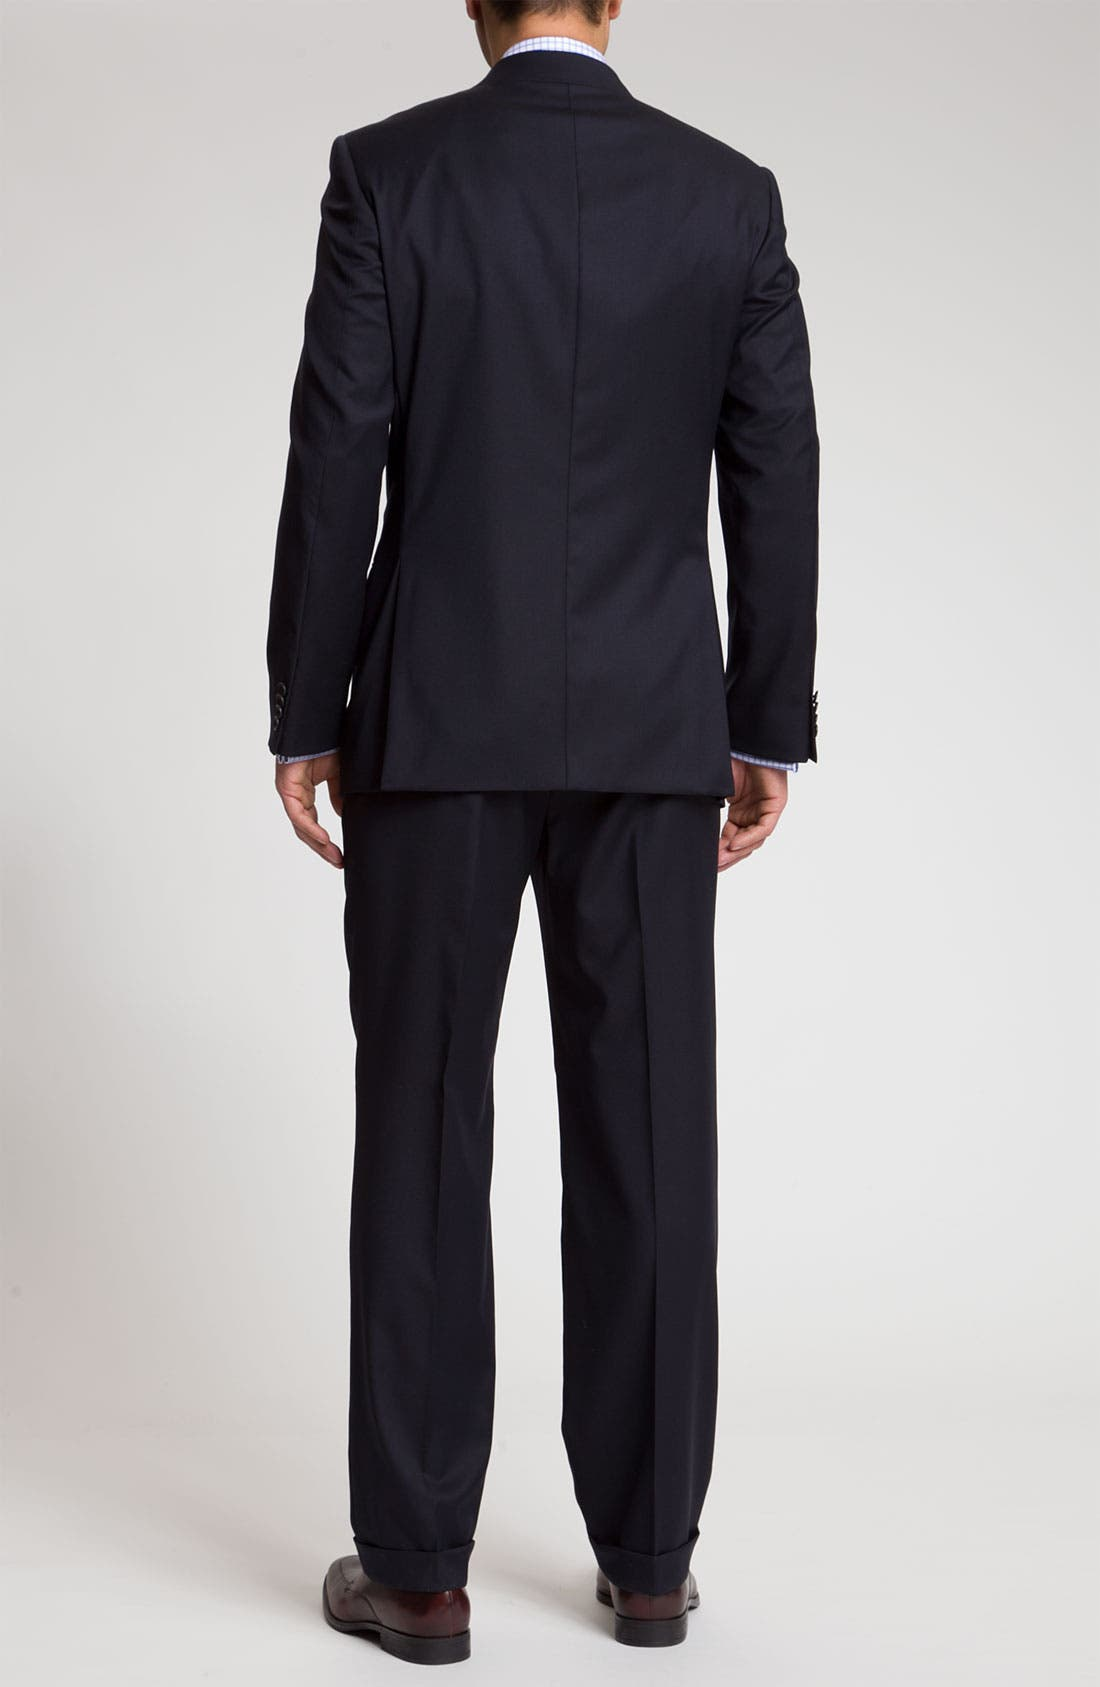 Alternate Image 3  - Joseph Abboud 'Signature Silver' Navy Wool Suit